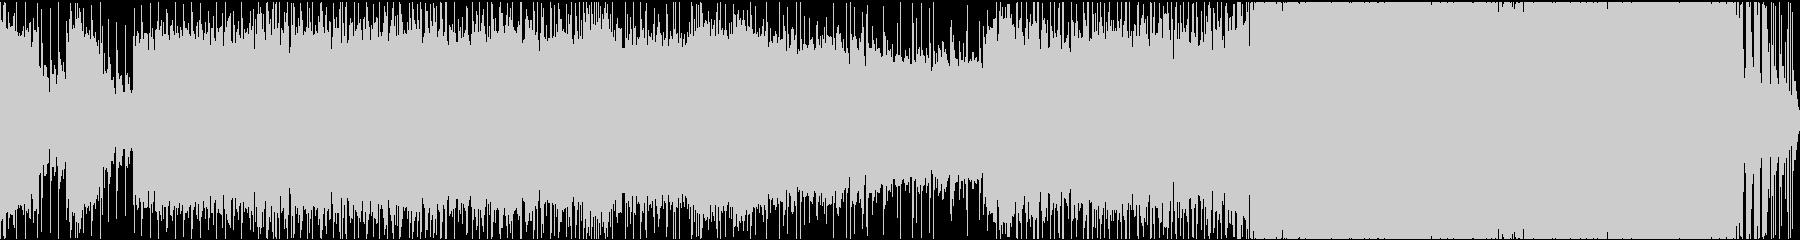 2DのRPG戦闘曲ロック/ピアノの未再生の波形